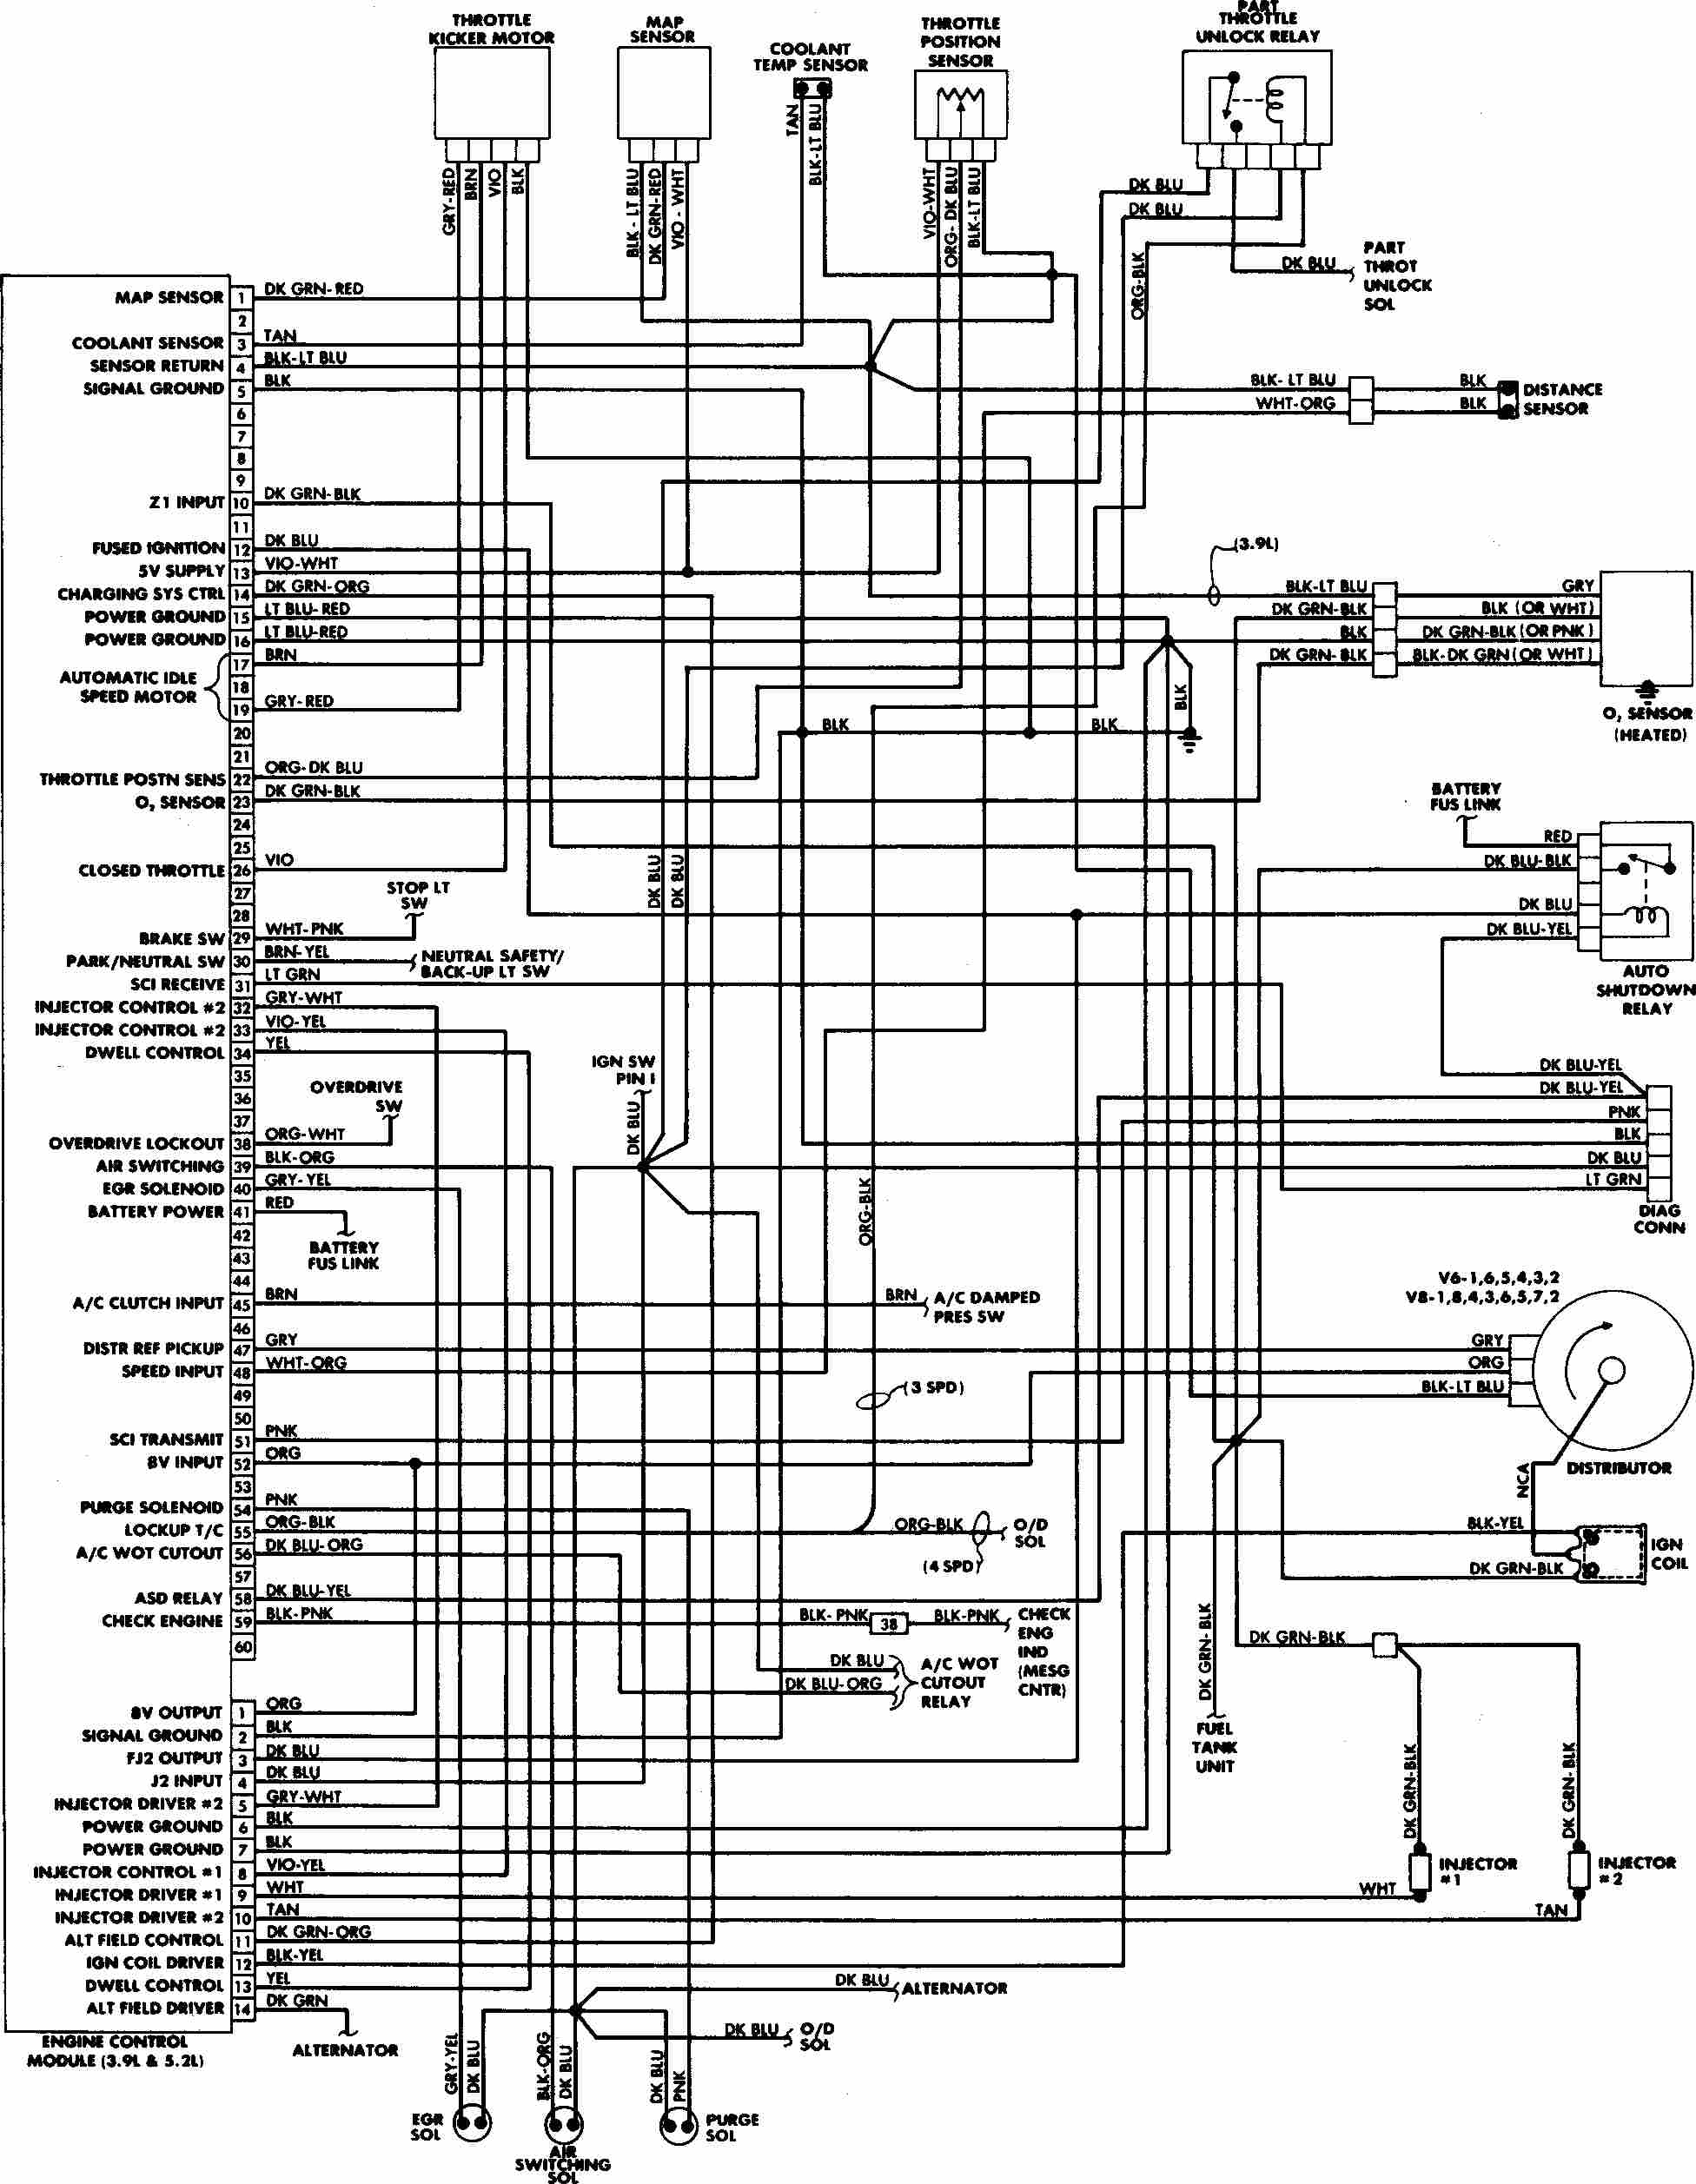 Ottawa Yard Truck Wiring    Diagram         Free    Wiring    Diagram